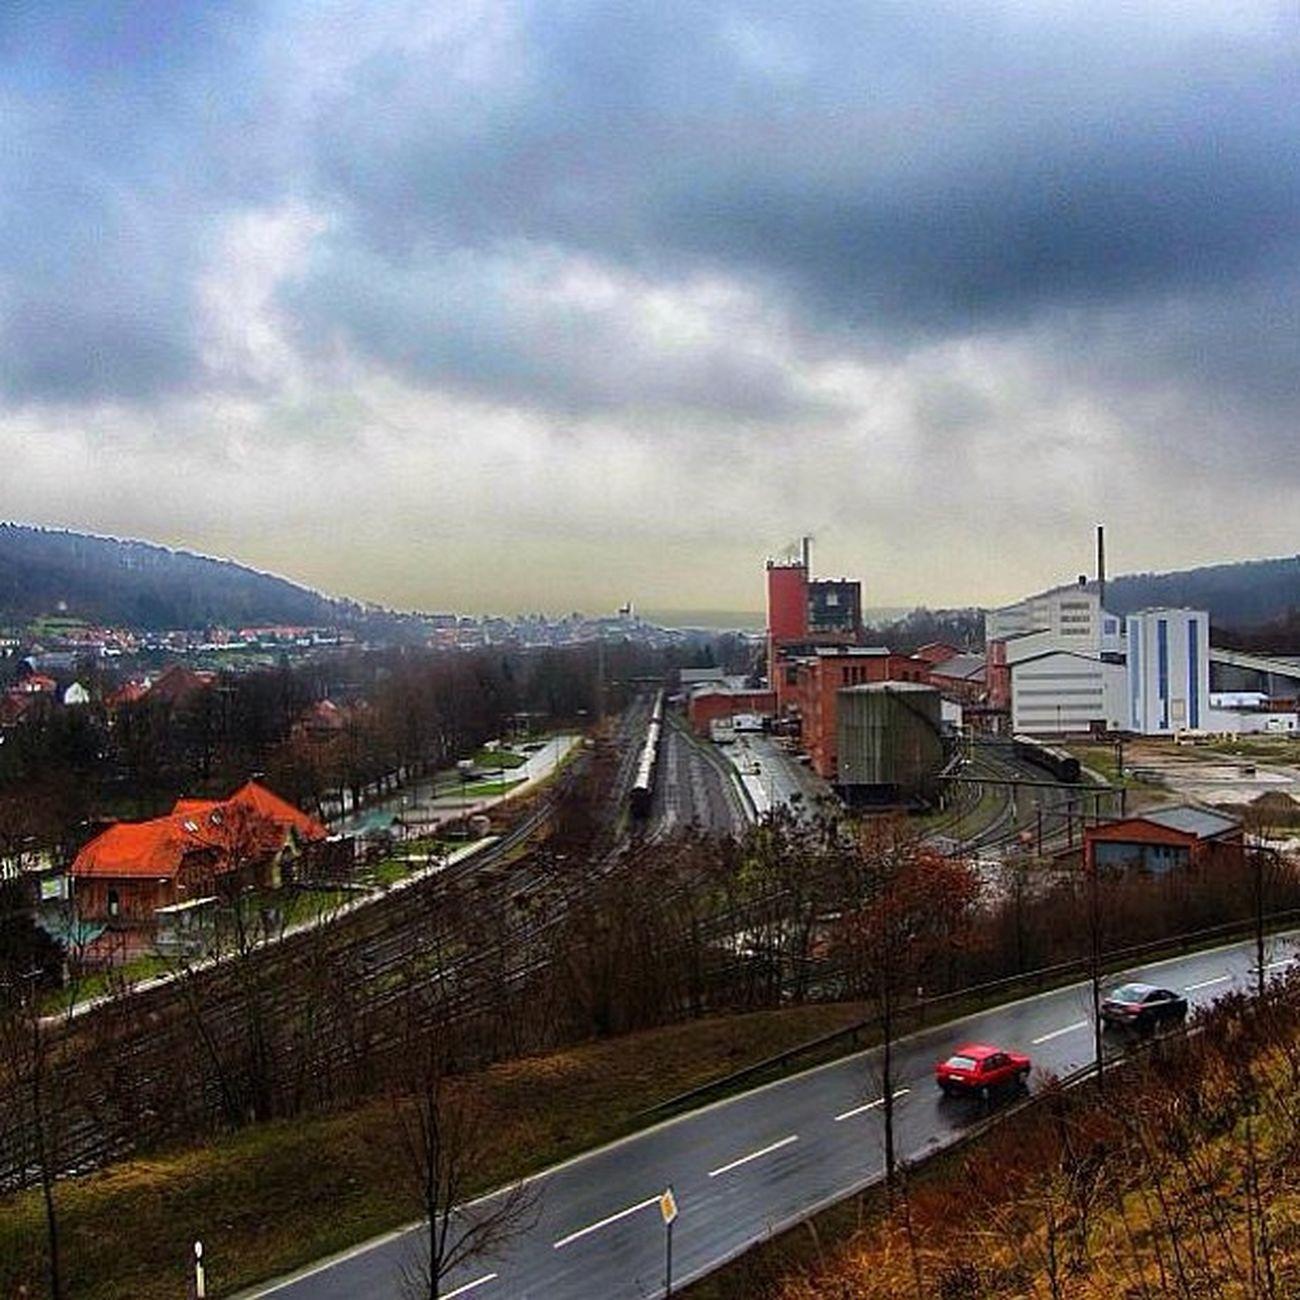 Sklblog Salzdetfurth Kaliwerk Bergwerk